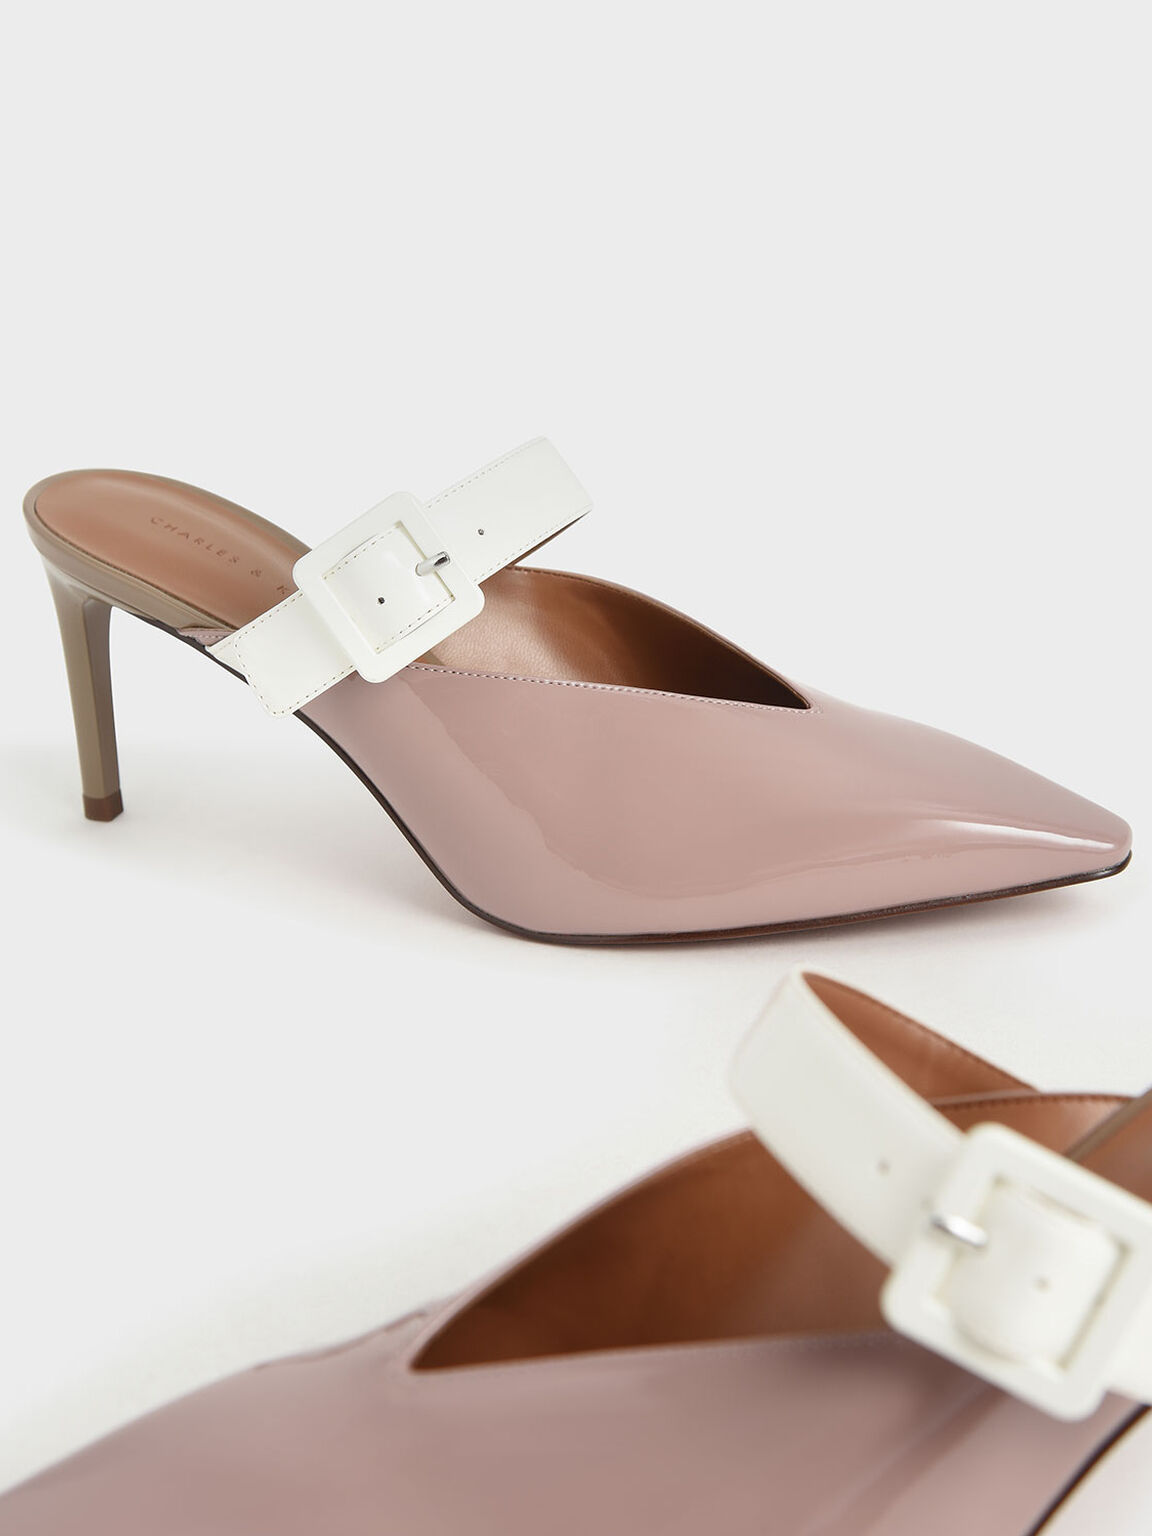 Patent Mary Jane Strap Stiletto Mules, Mauve, hi-res